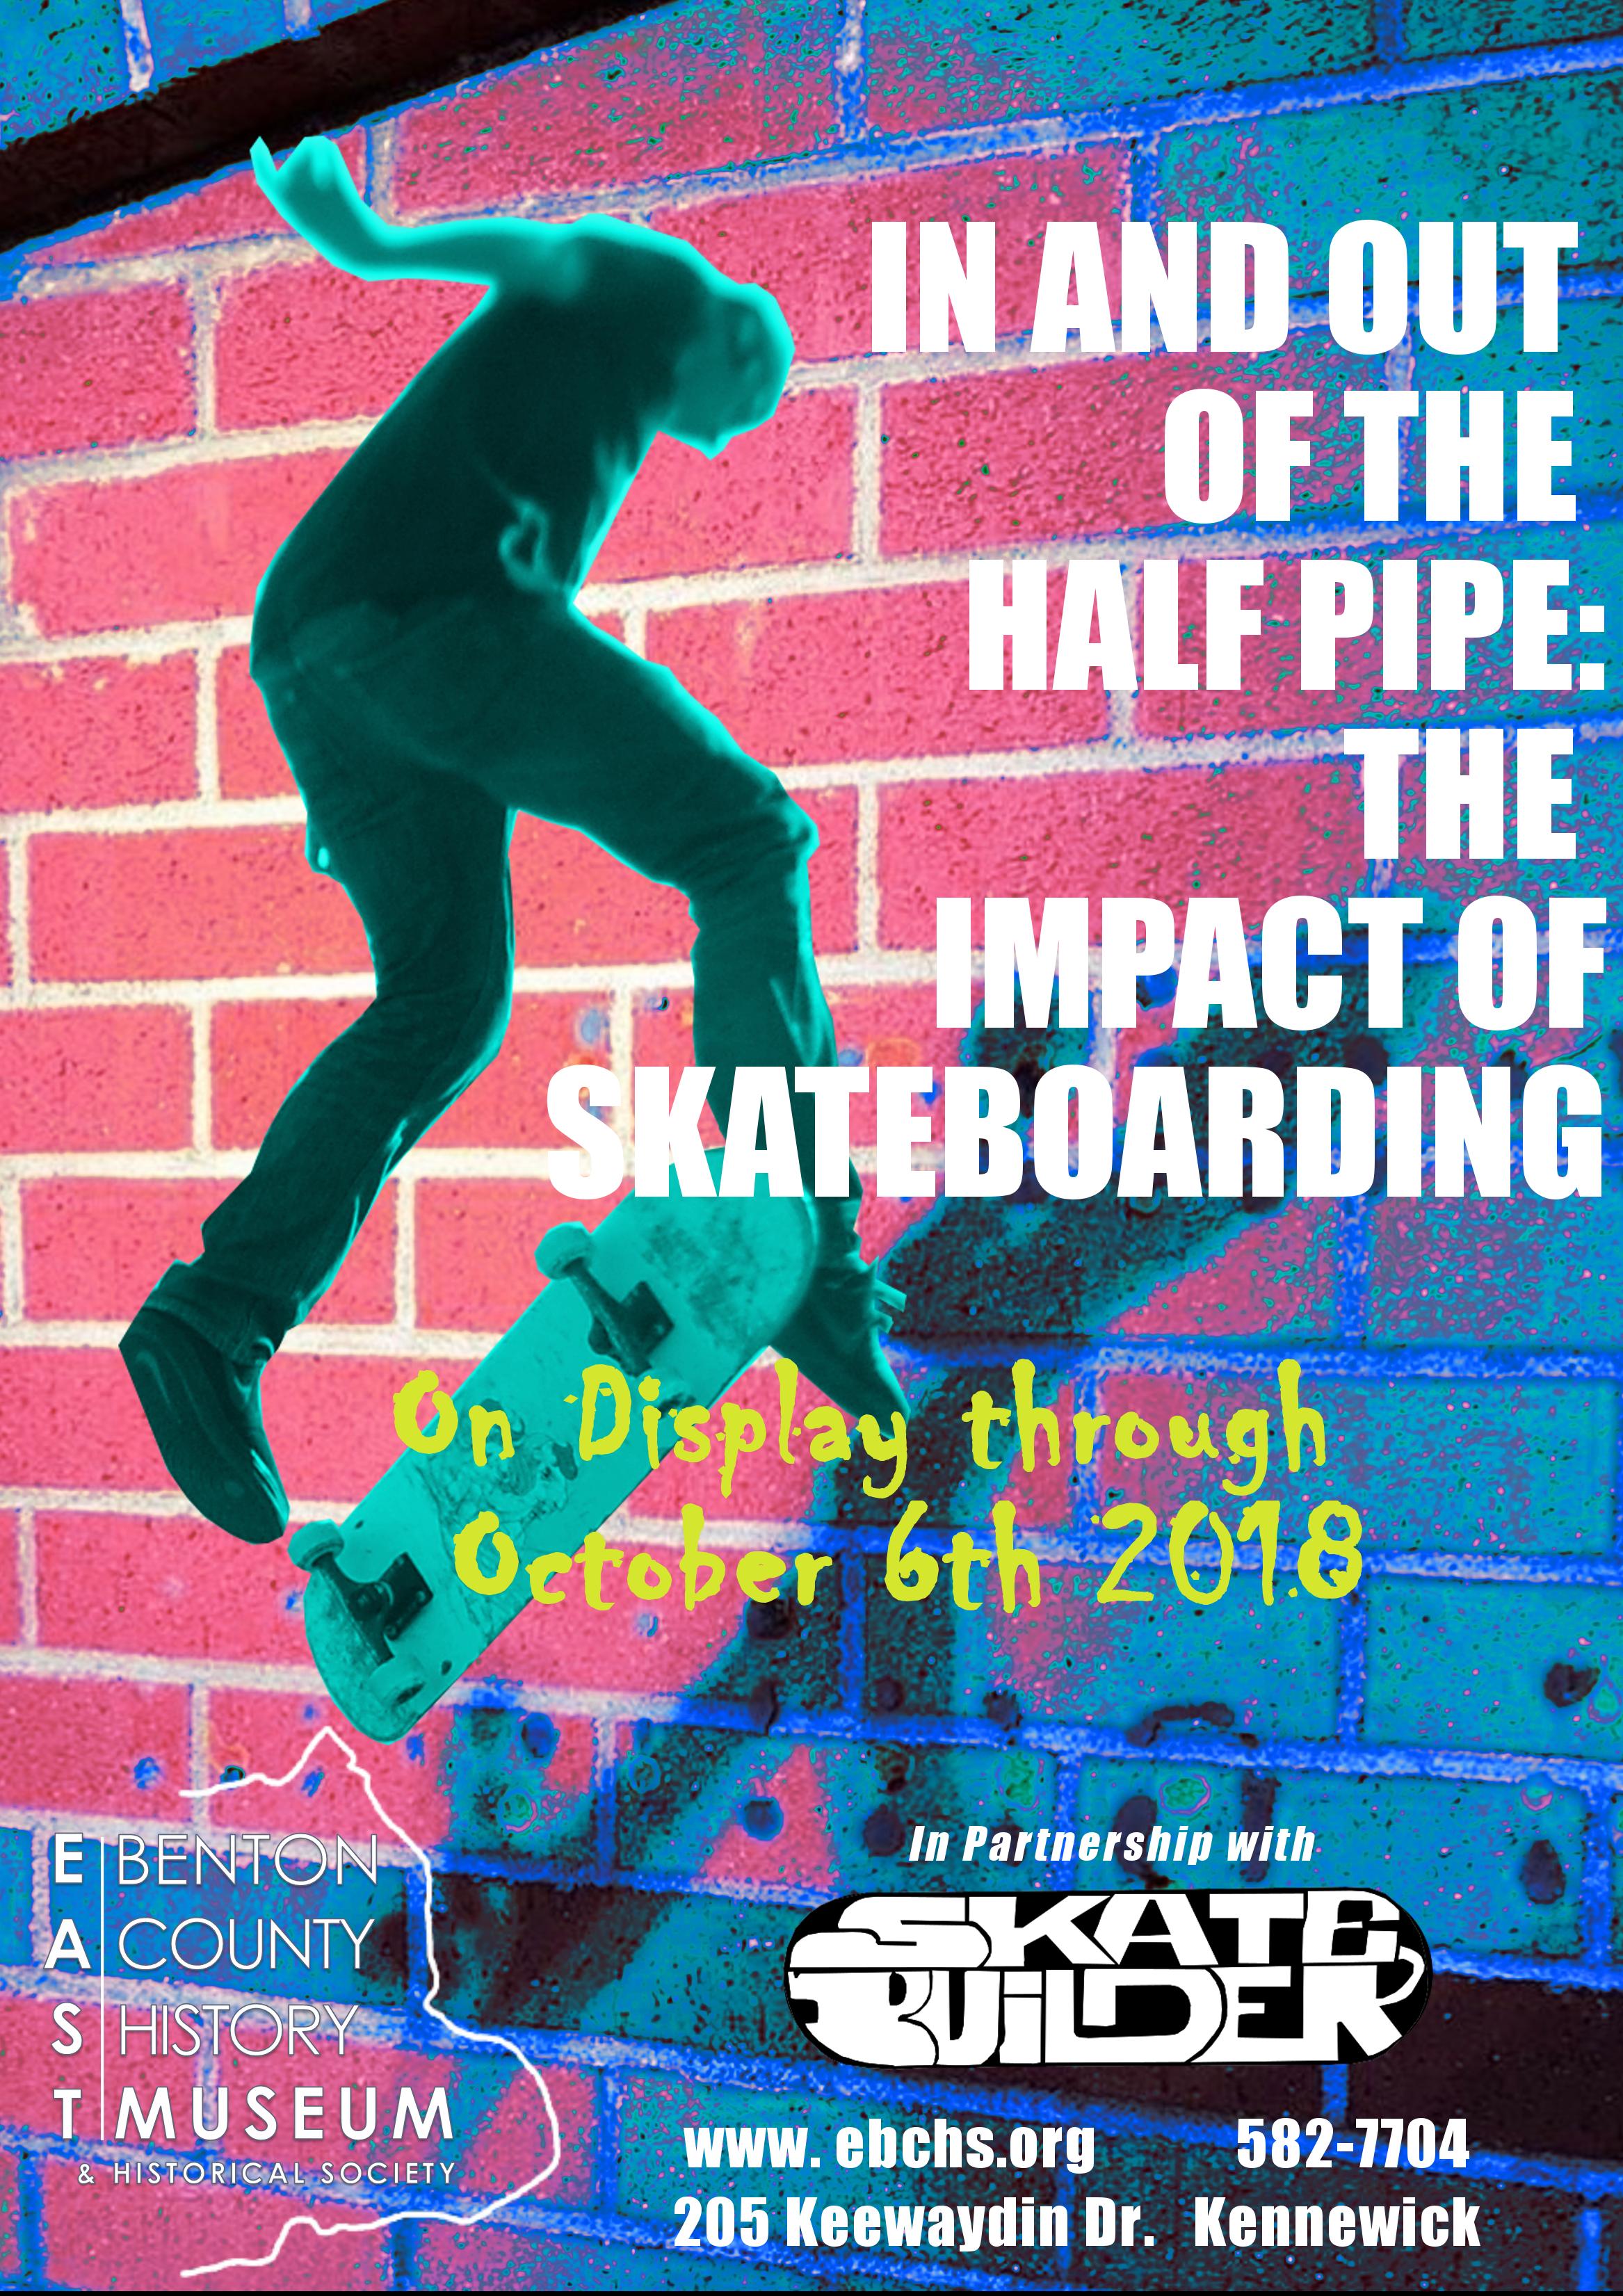 Skateboarding Poster3.png